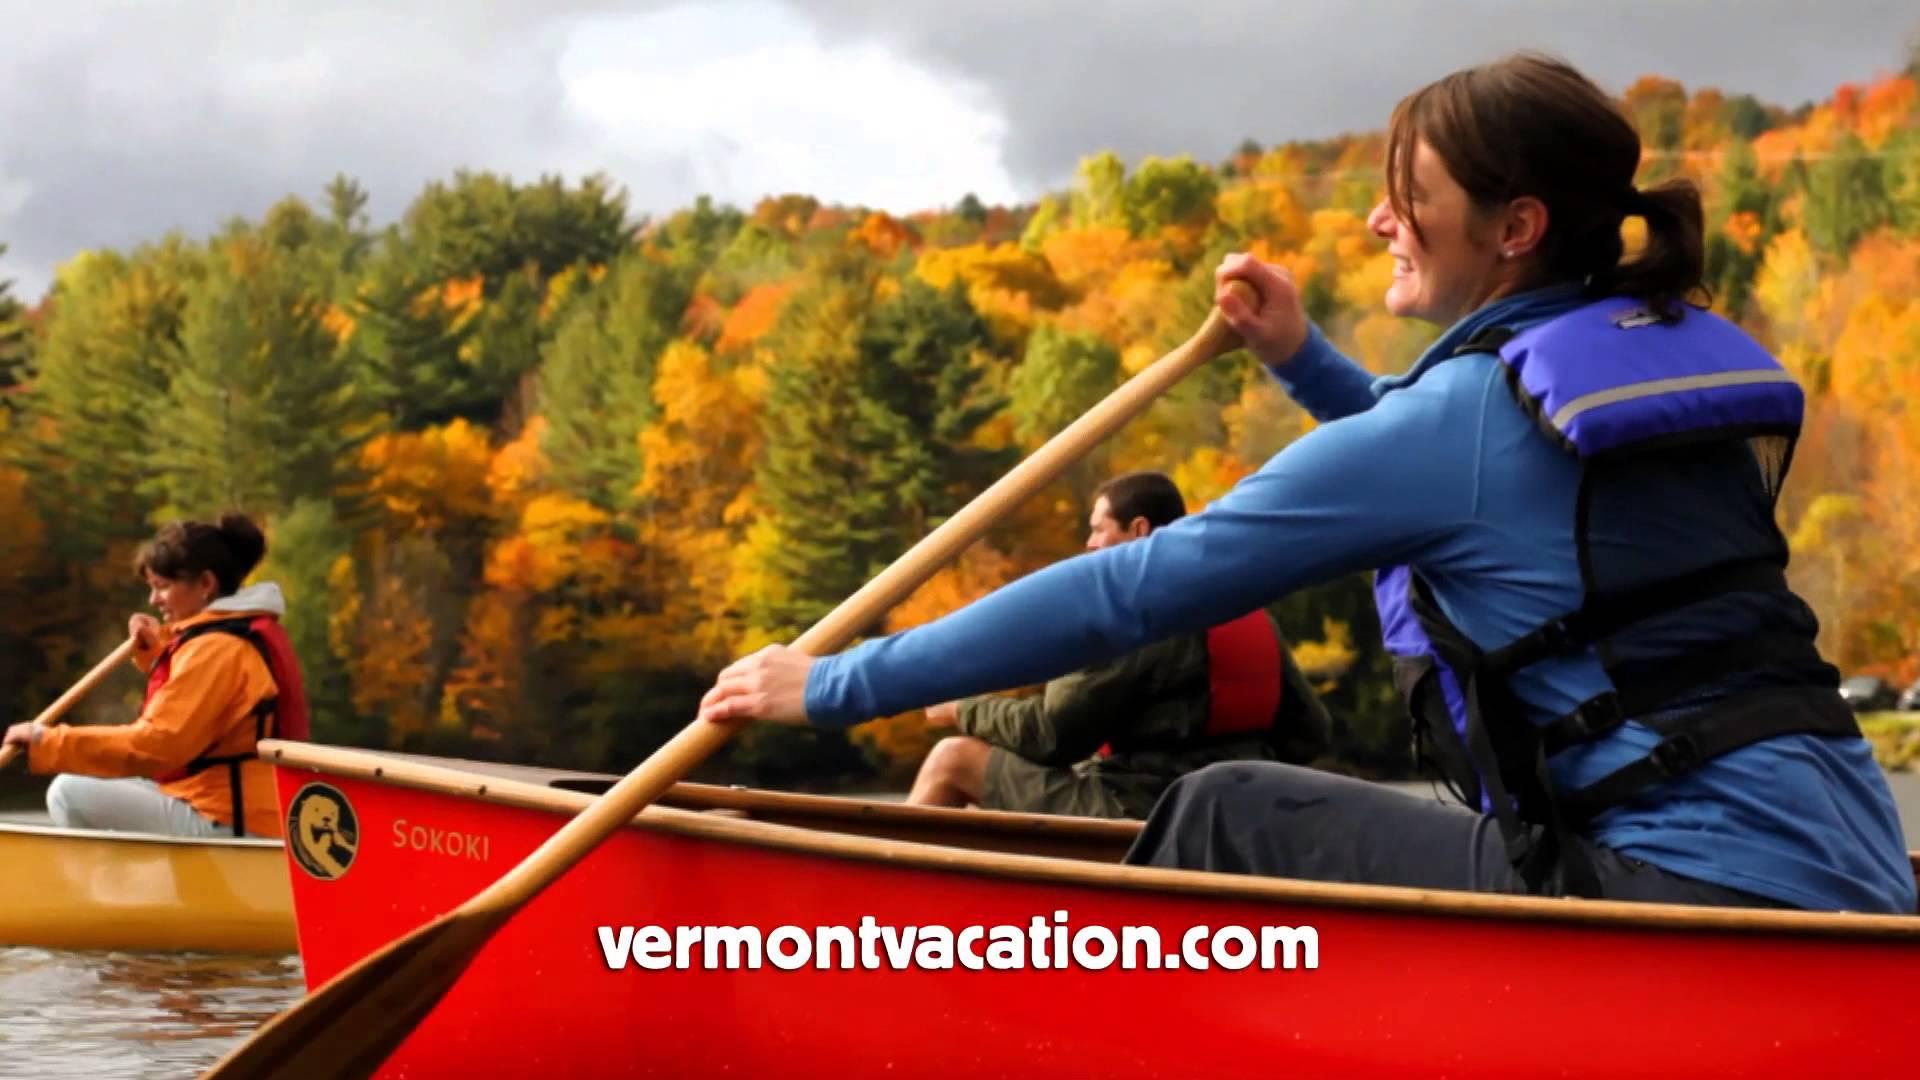 vermont website